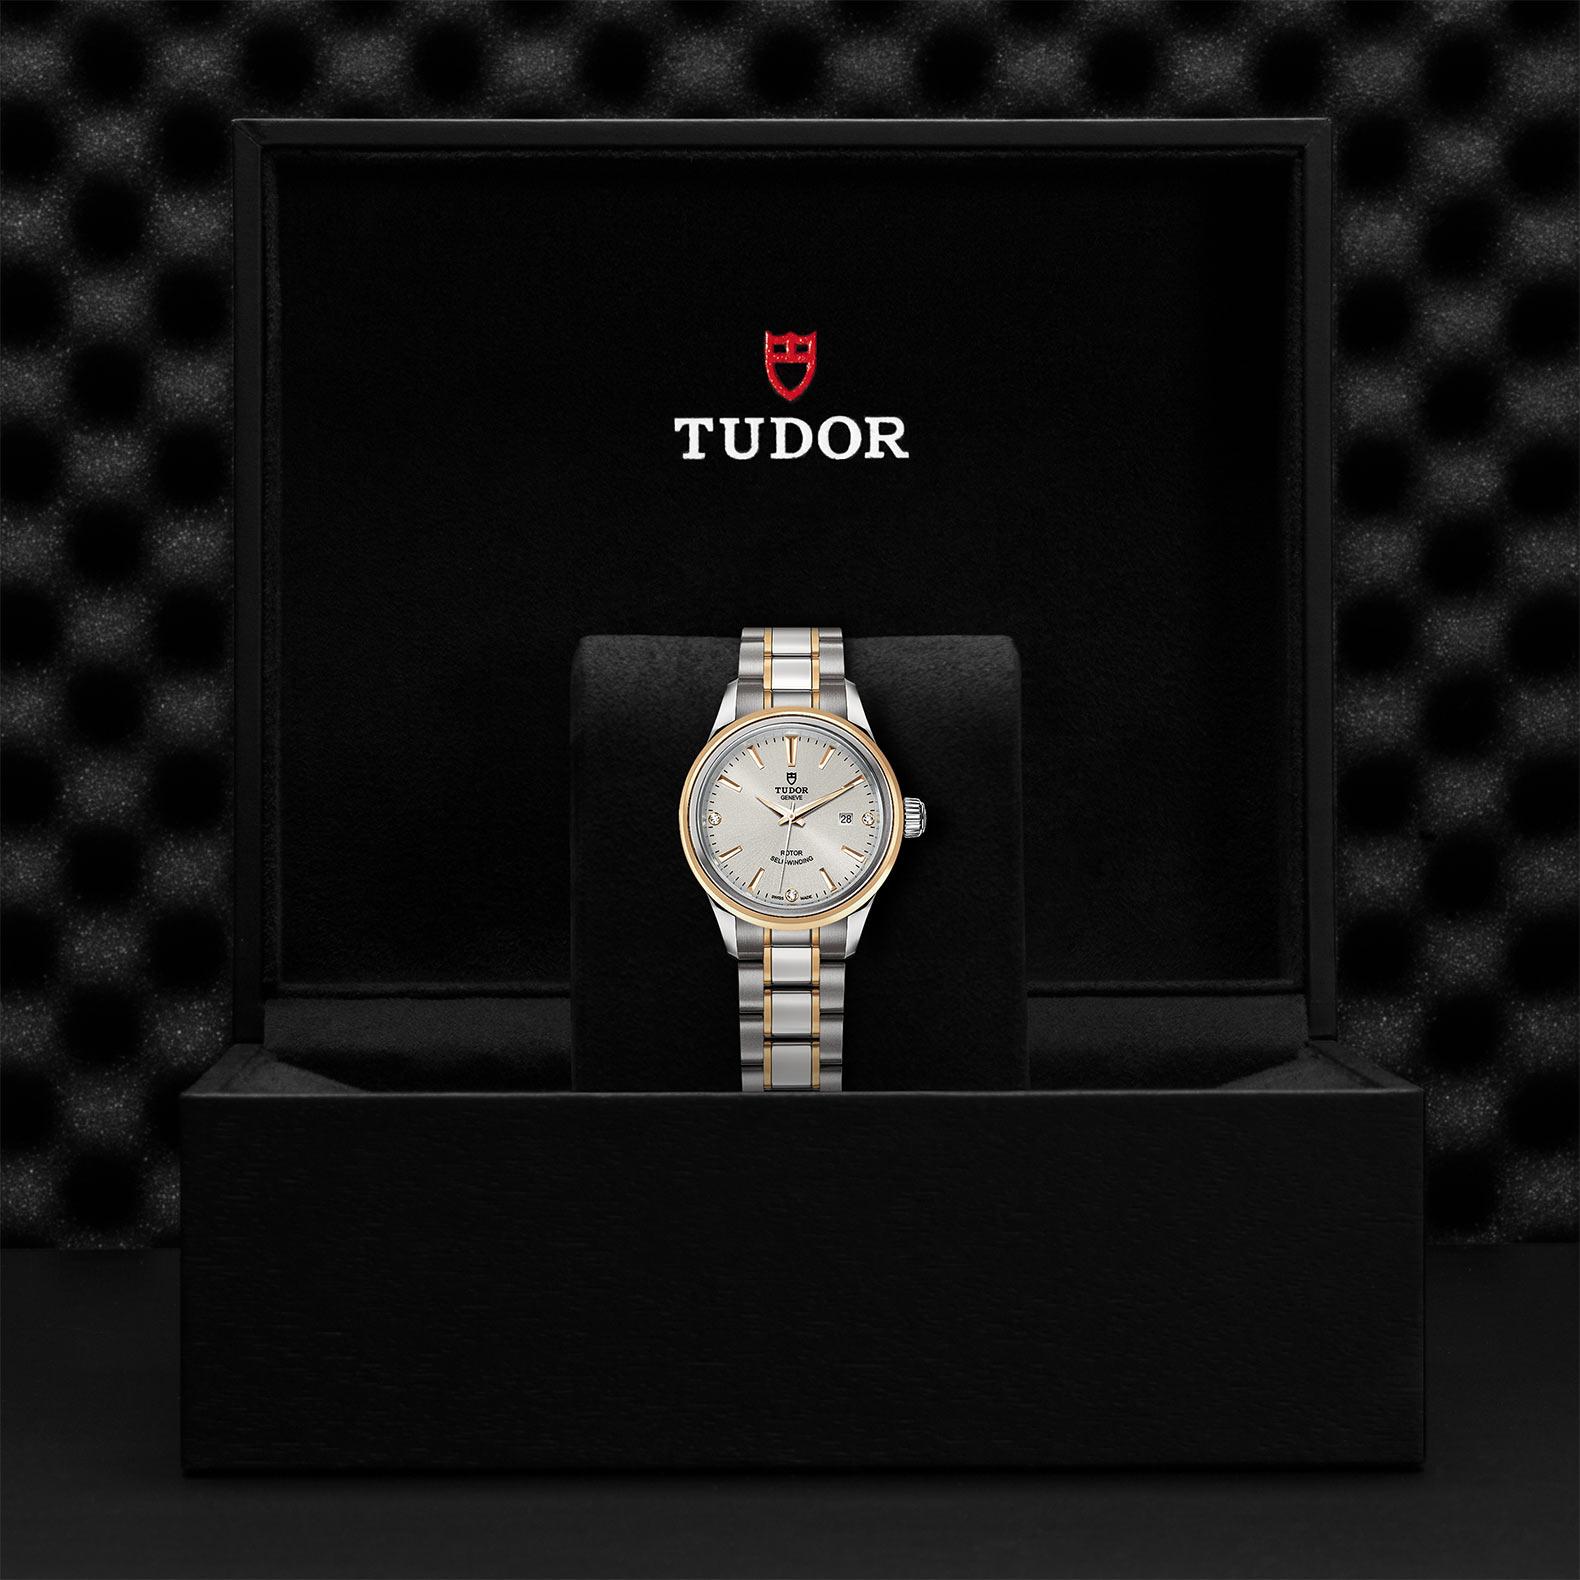 TUDOR Style M12103 0005 Presentationbox